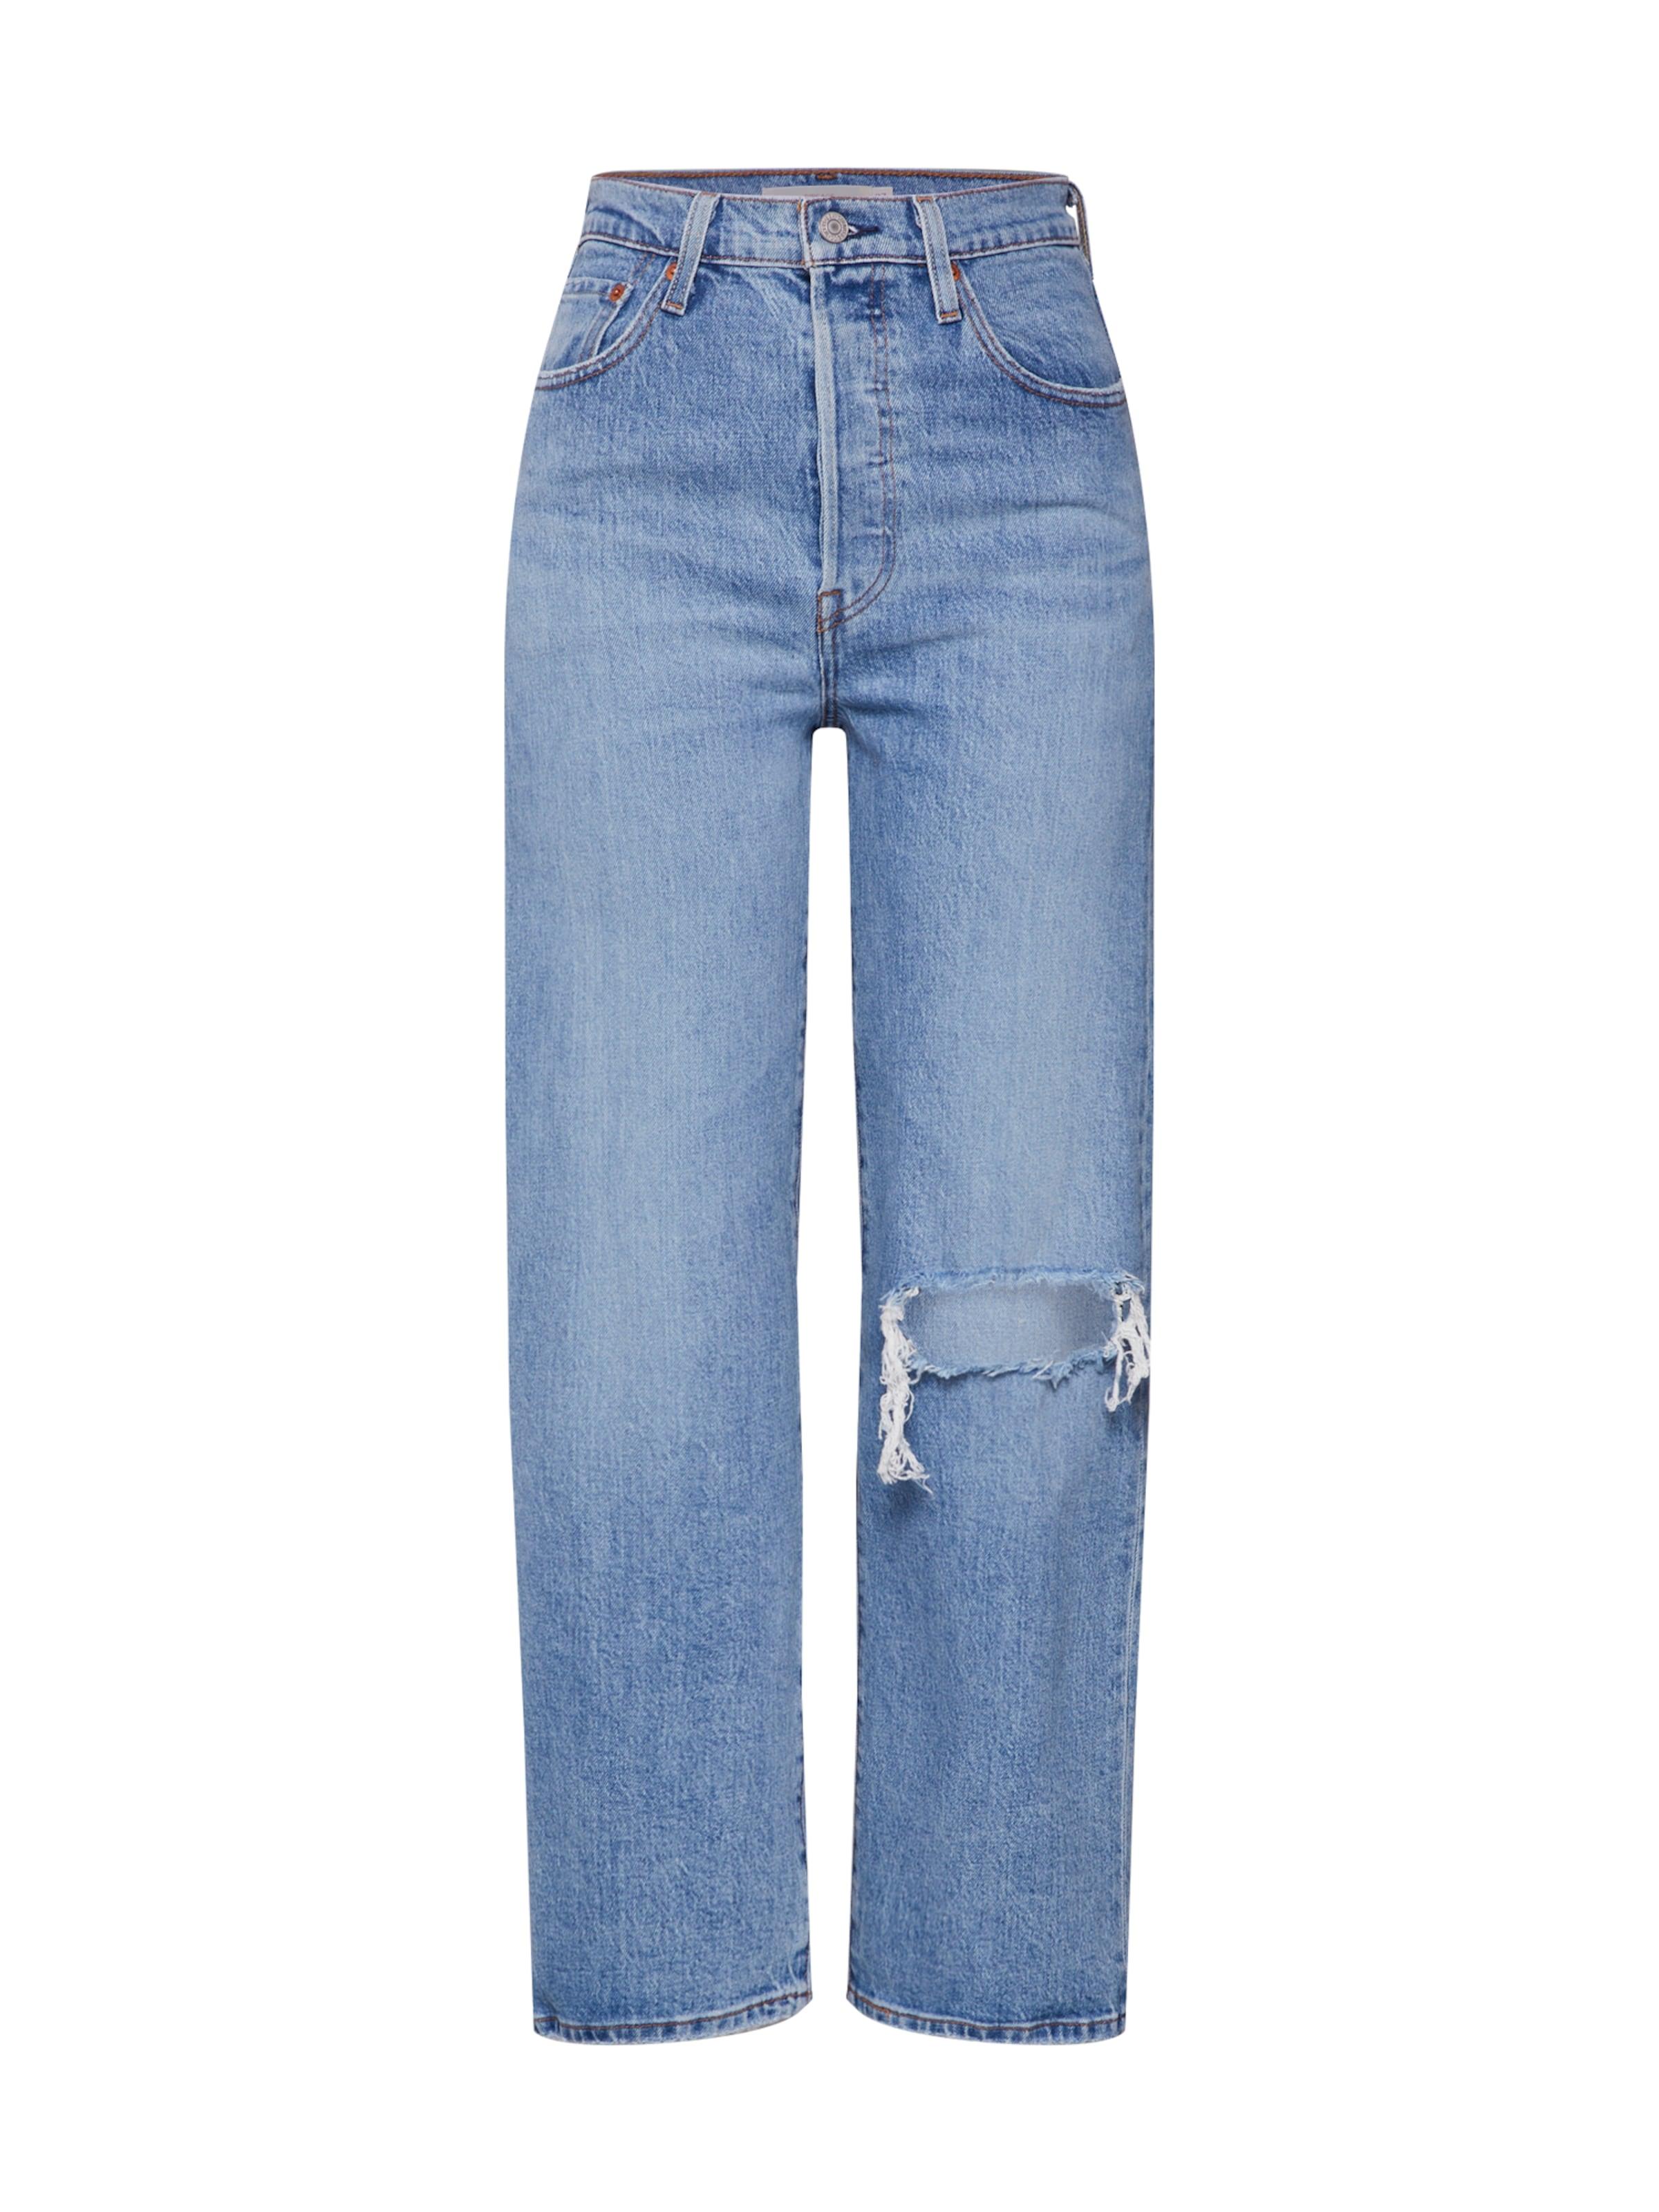 'ribcage' Denim In Levi's Jeans Blue VUpqzMS